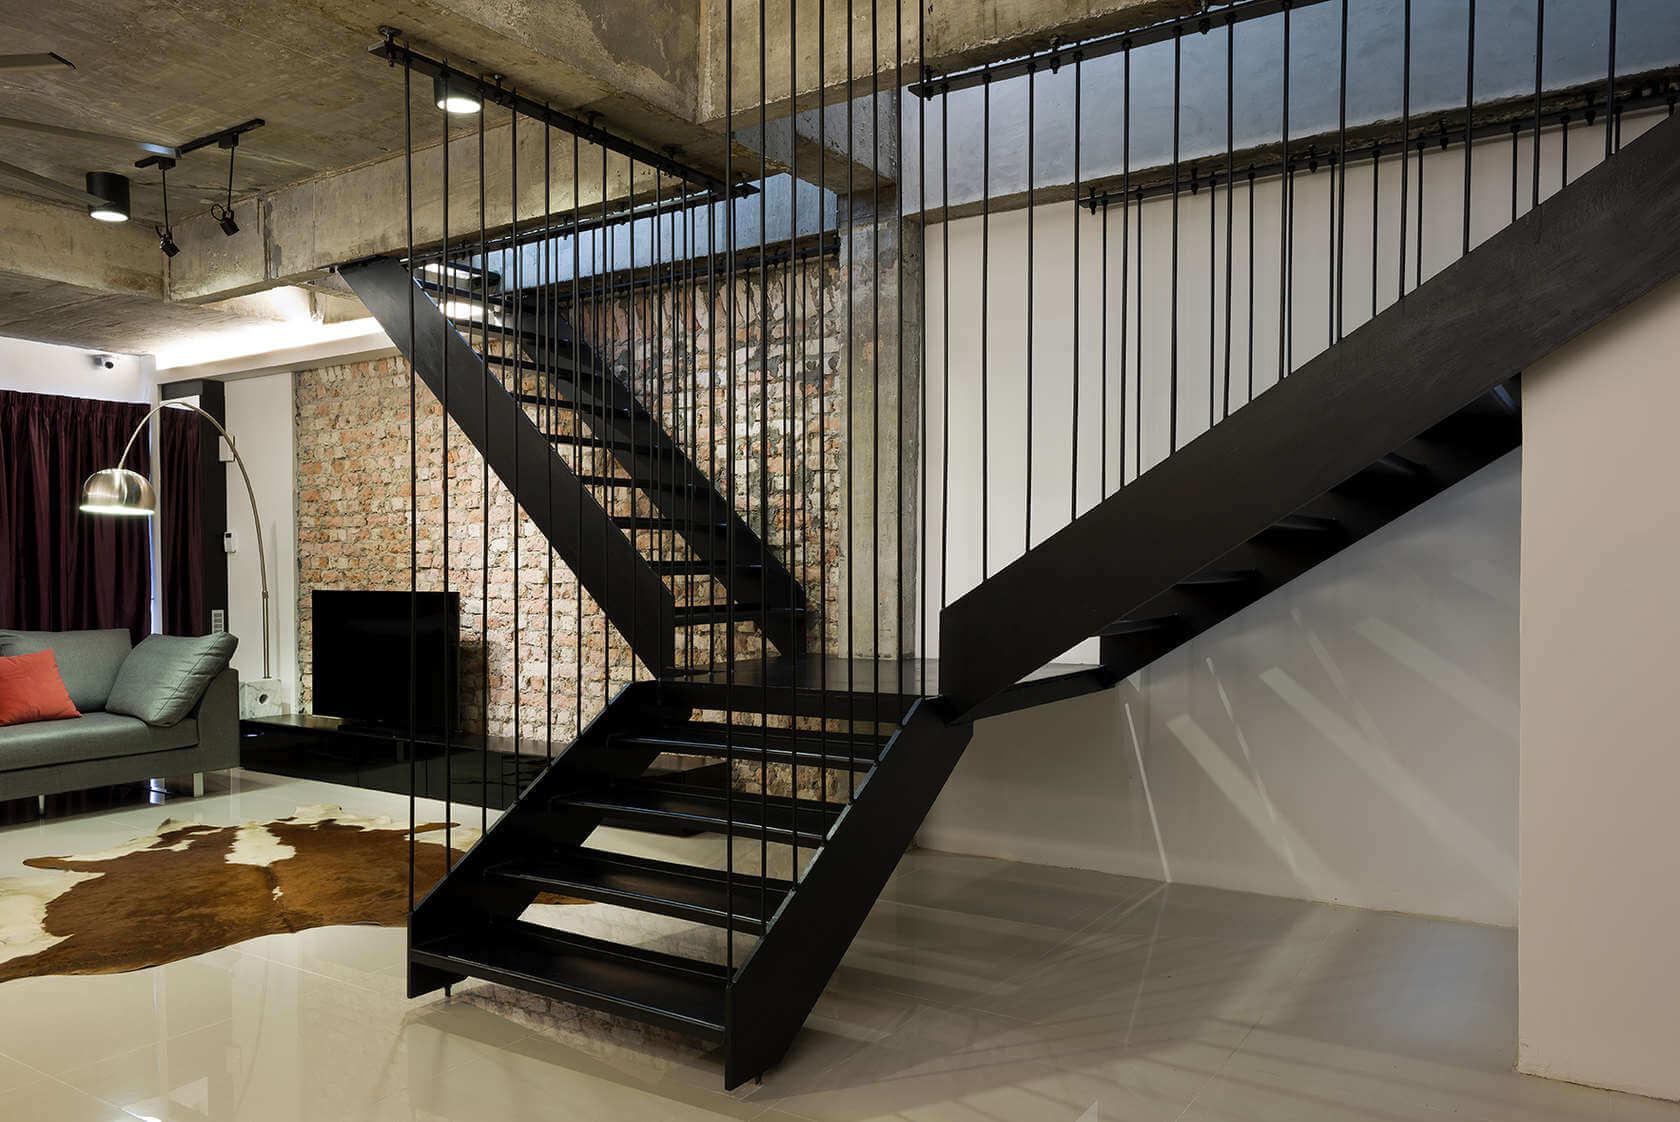 kuala-lumpur-home-drtan-lm-architect-07